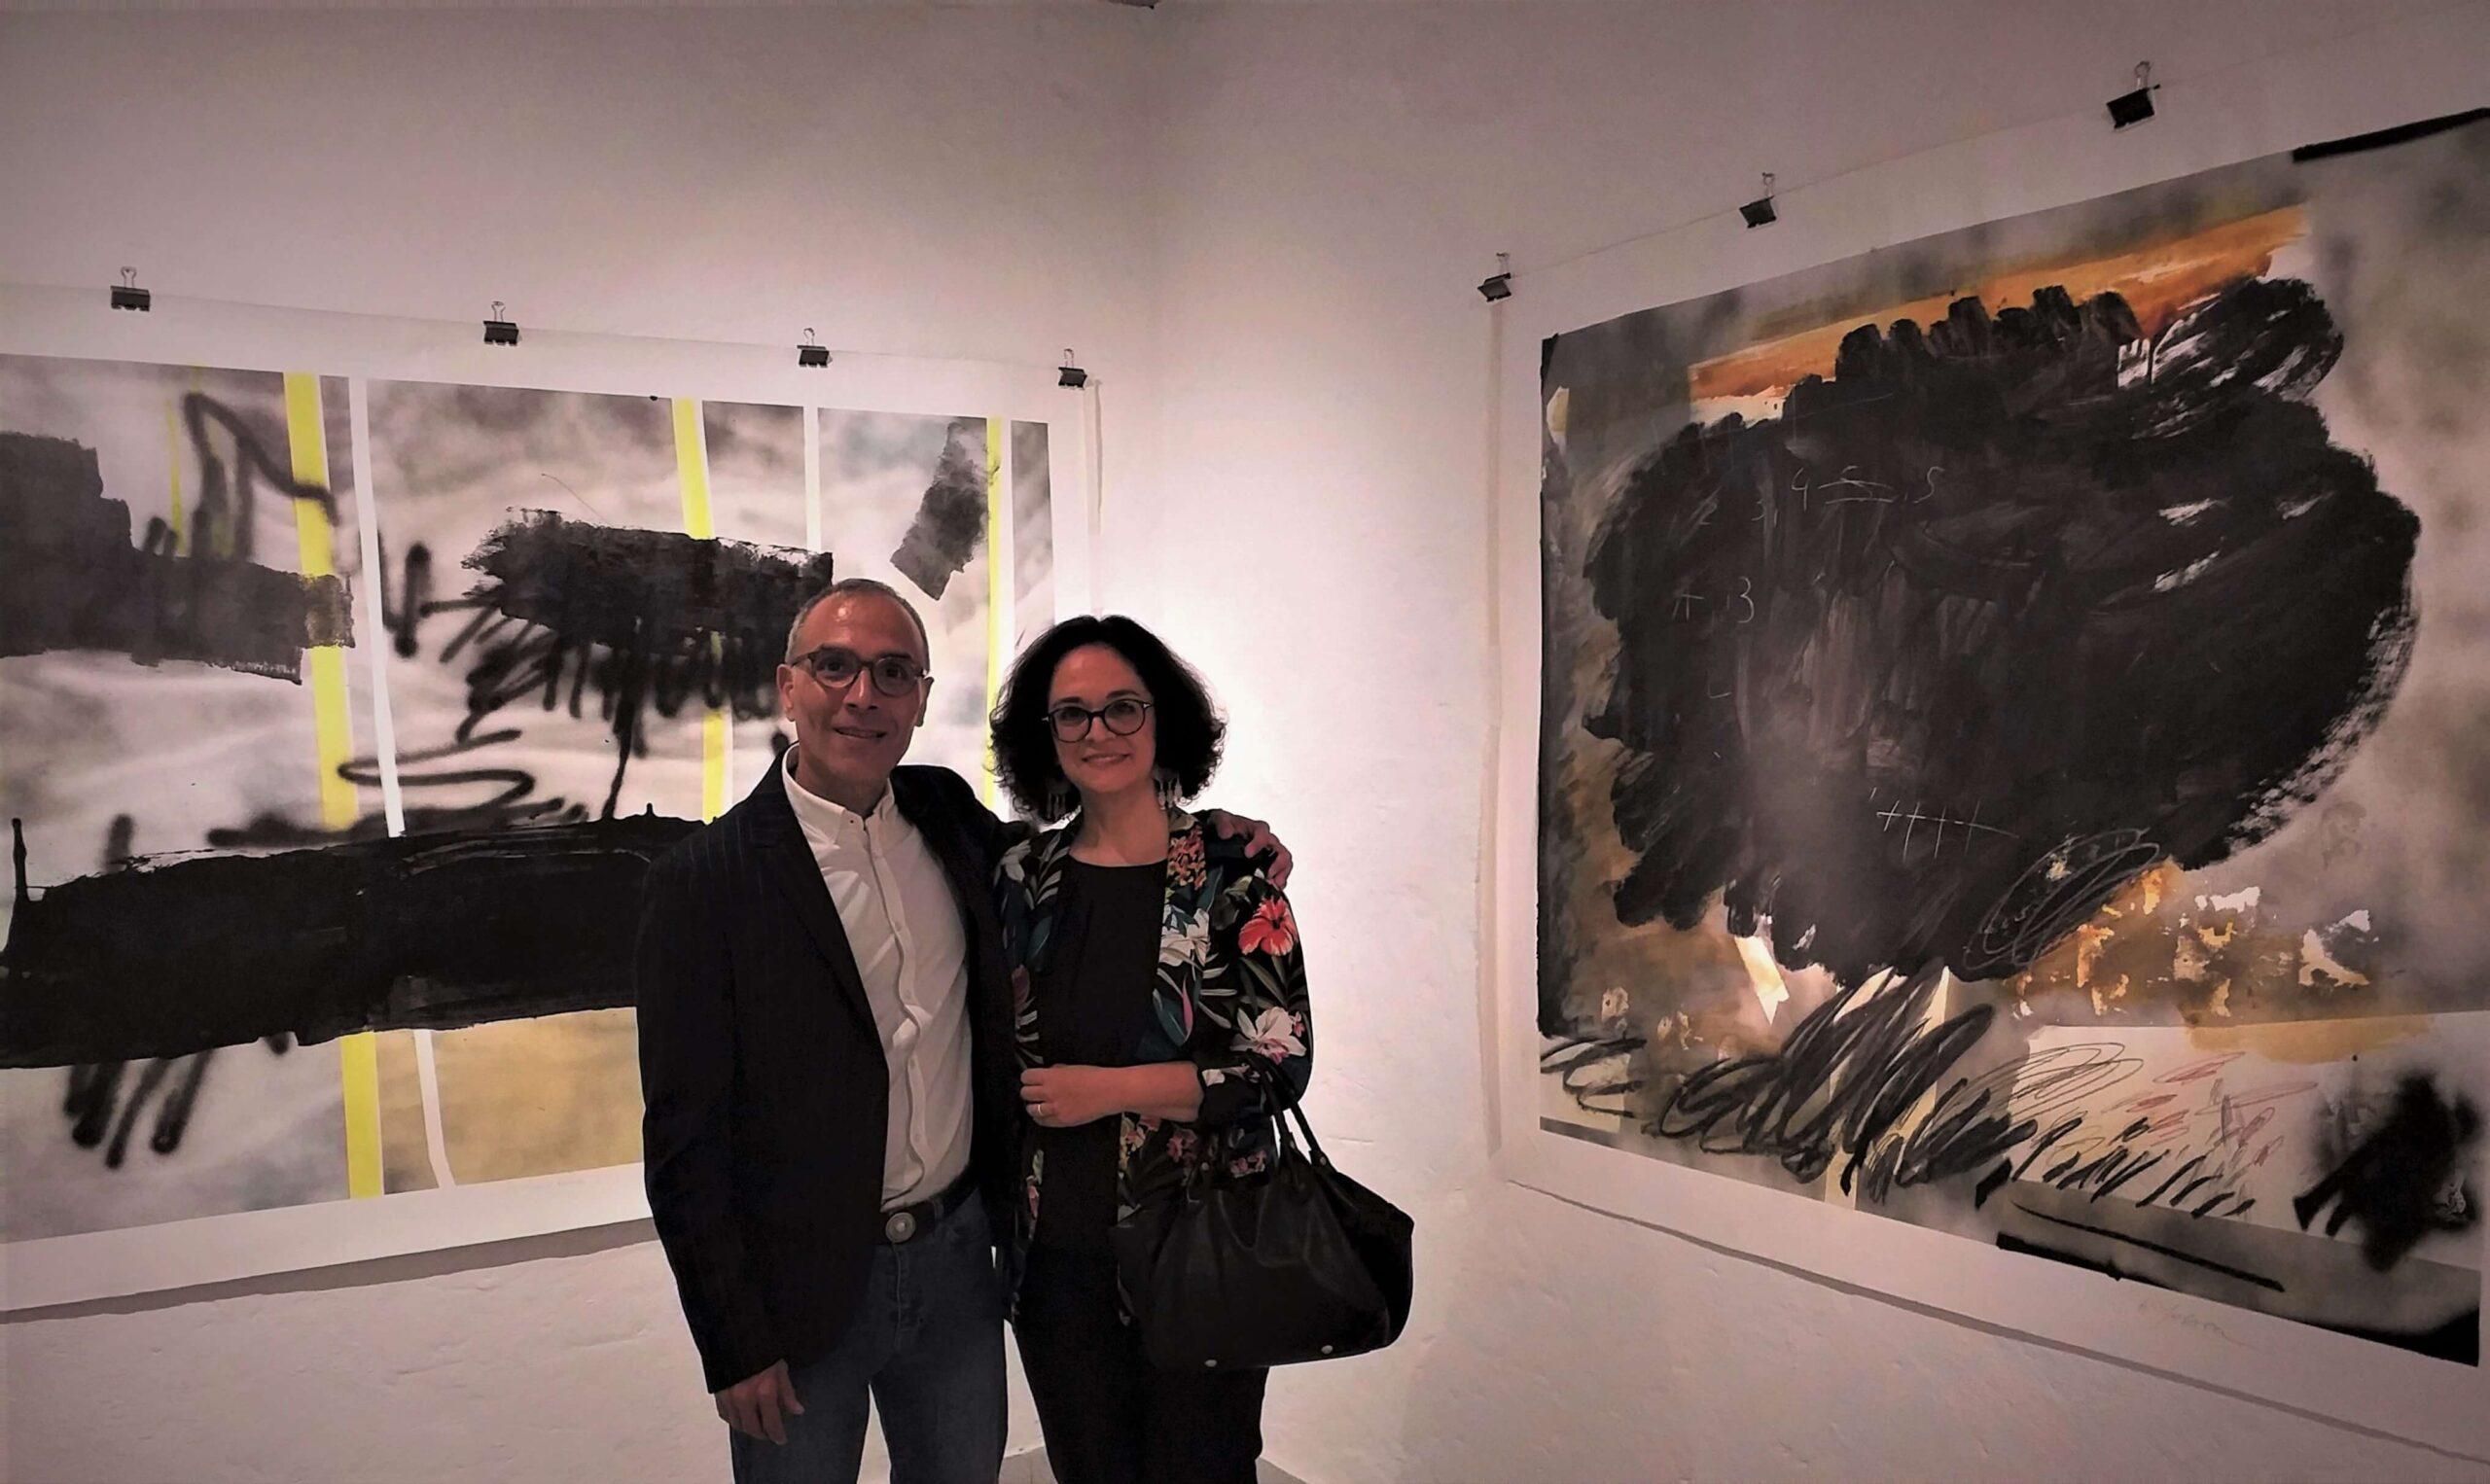 Nathalie Lacoste and Alexis Yebra